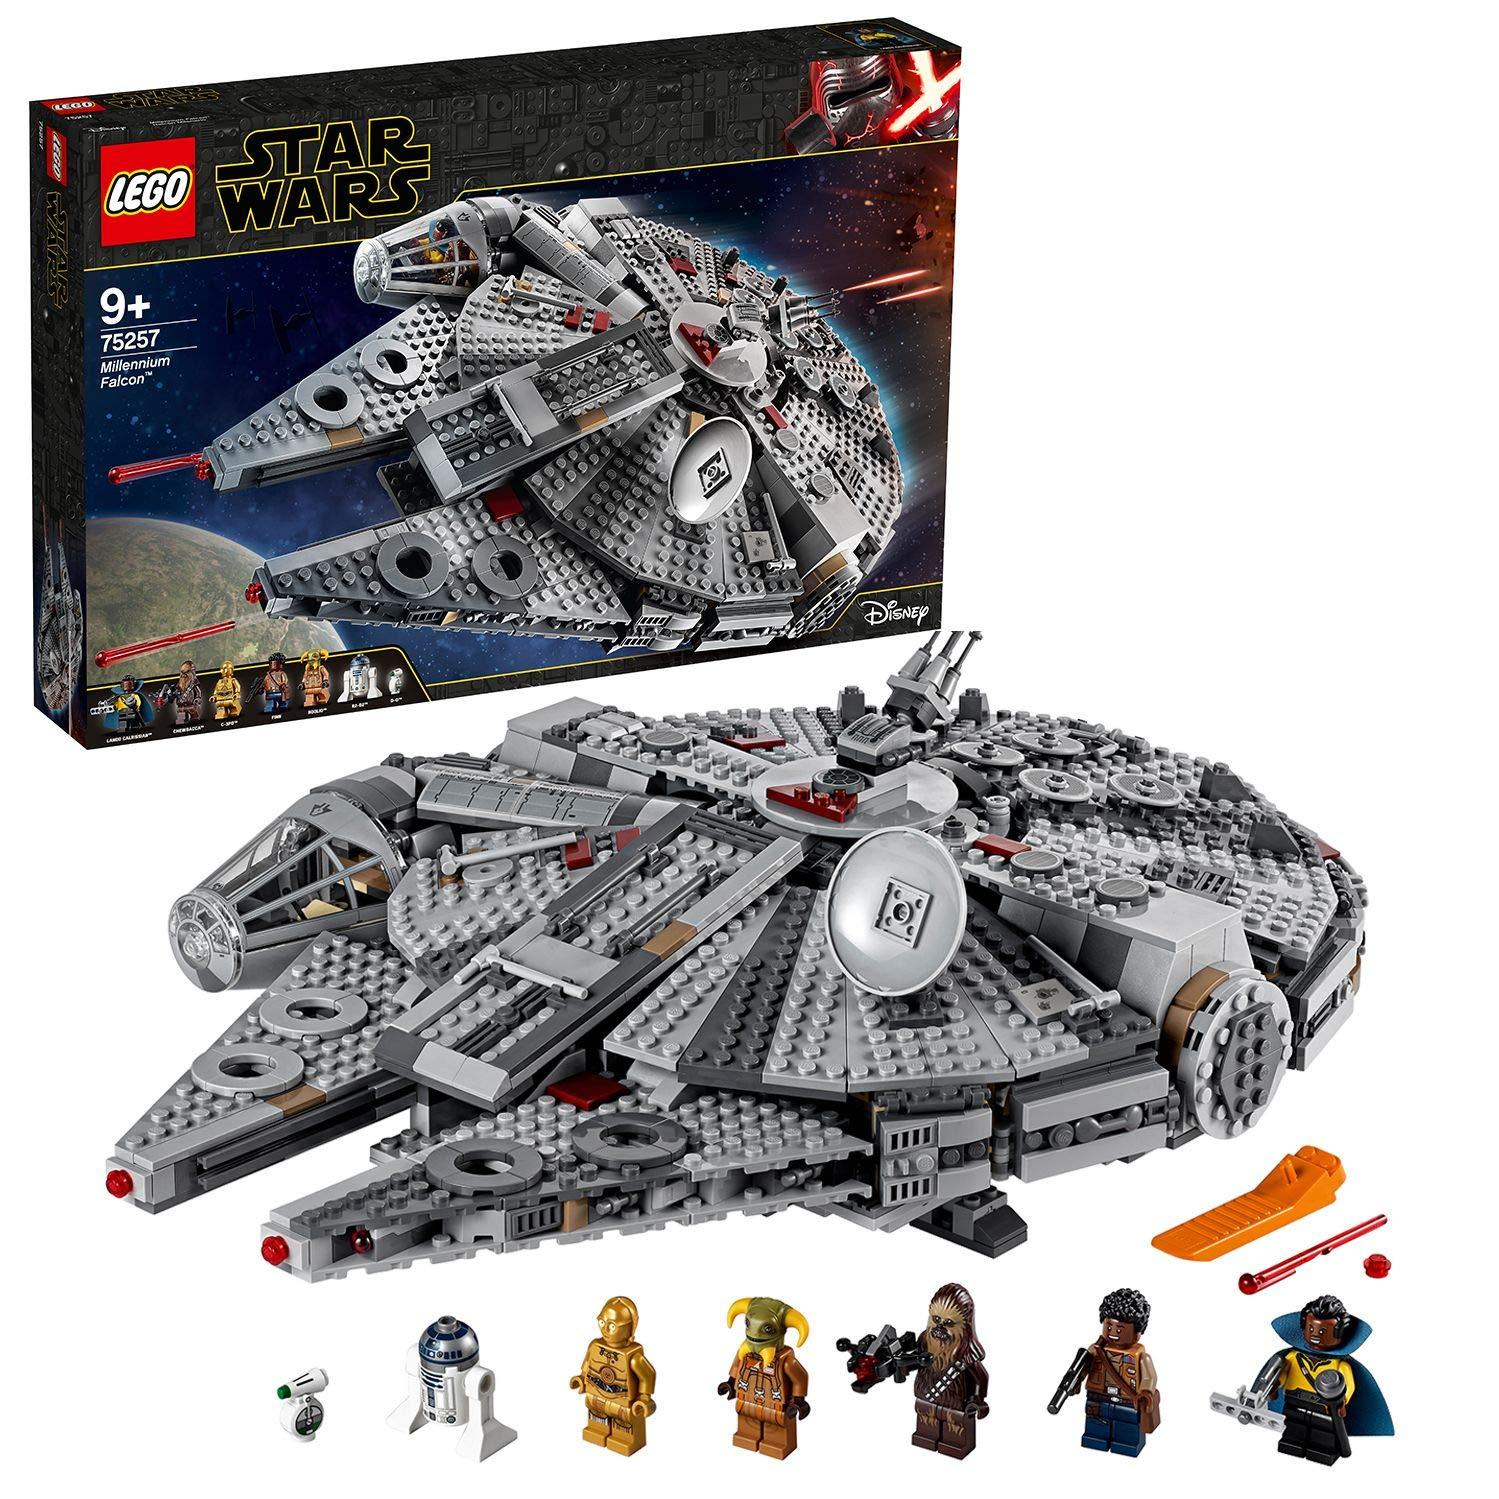 LEGO 75257 Star Wars Millennium Falcon Starship Construction Set £120 Amazon